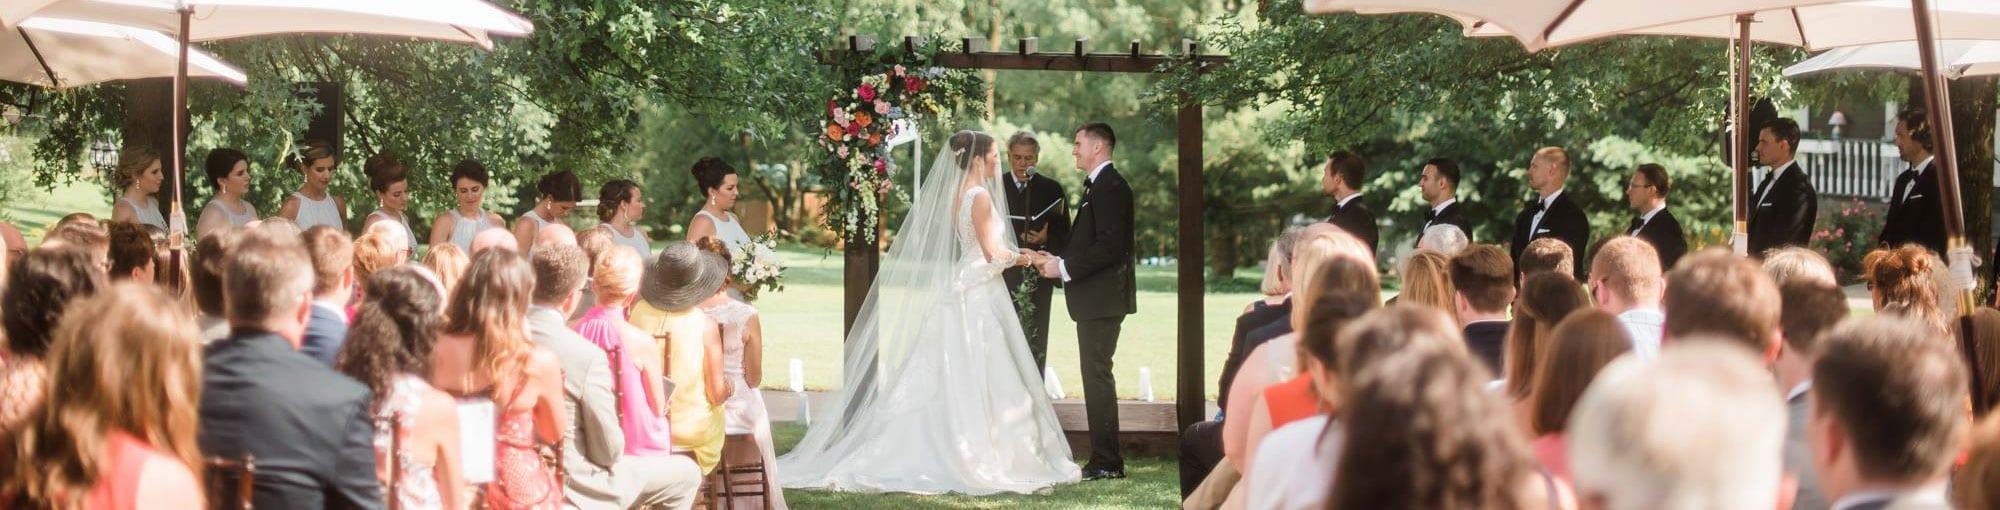 Pittsburgh Wedding Planners